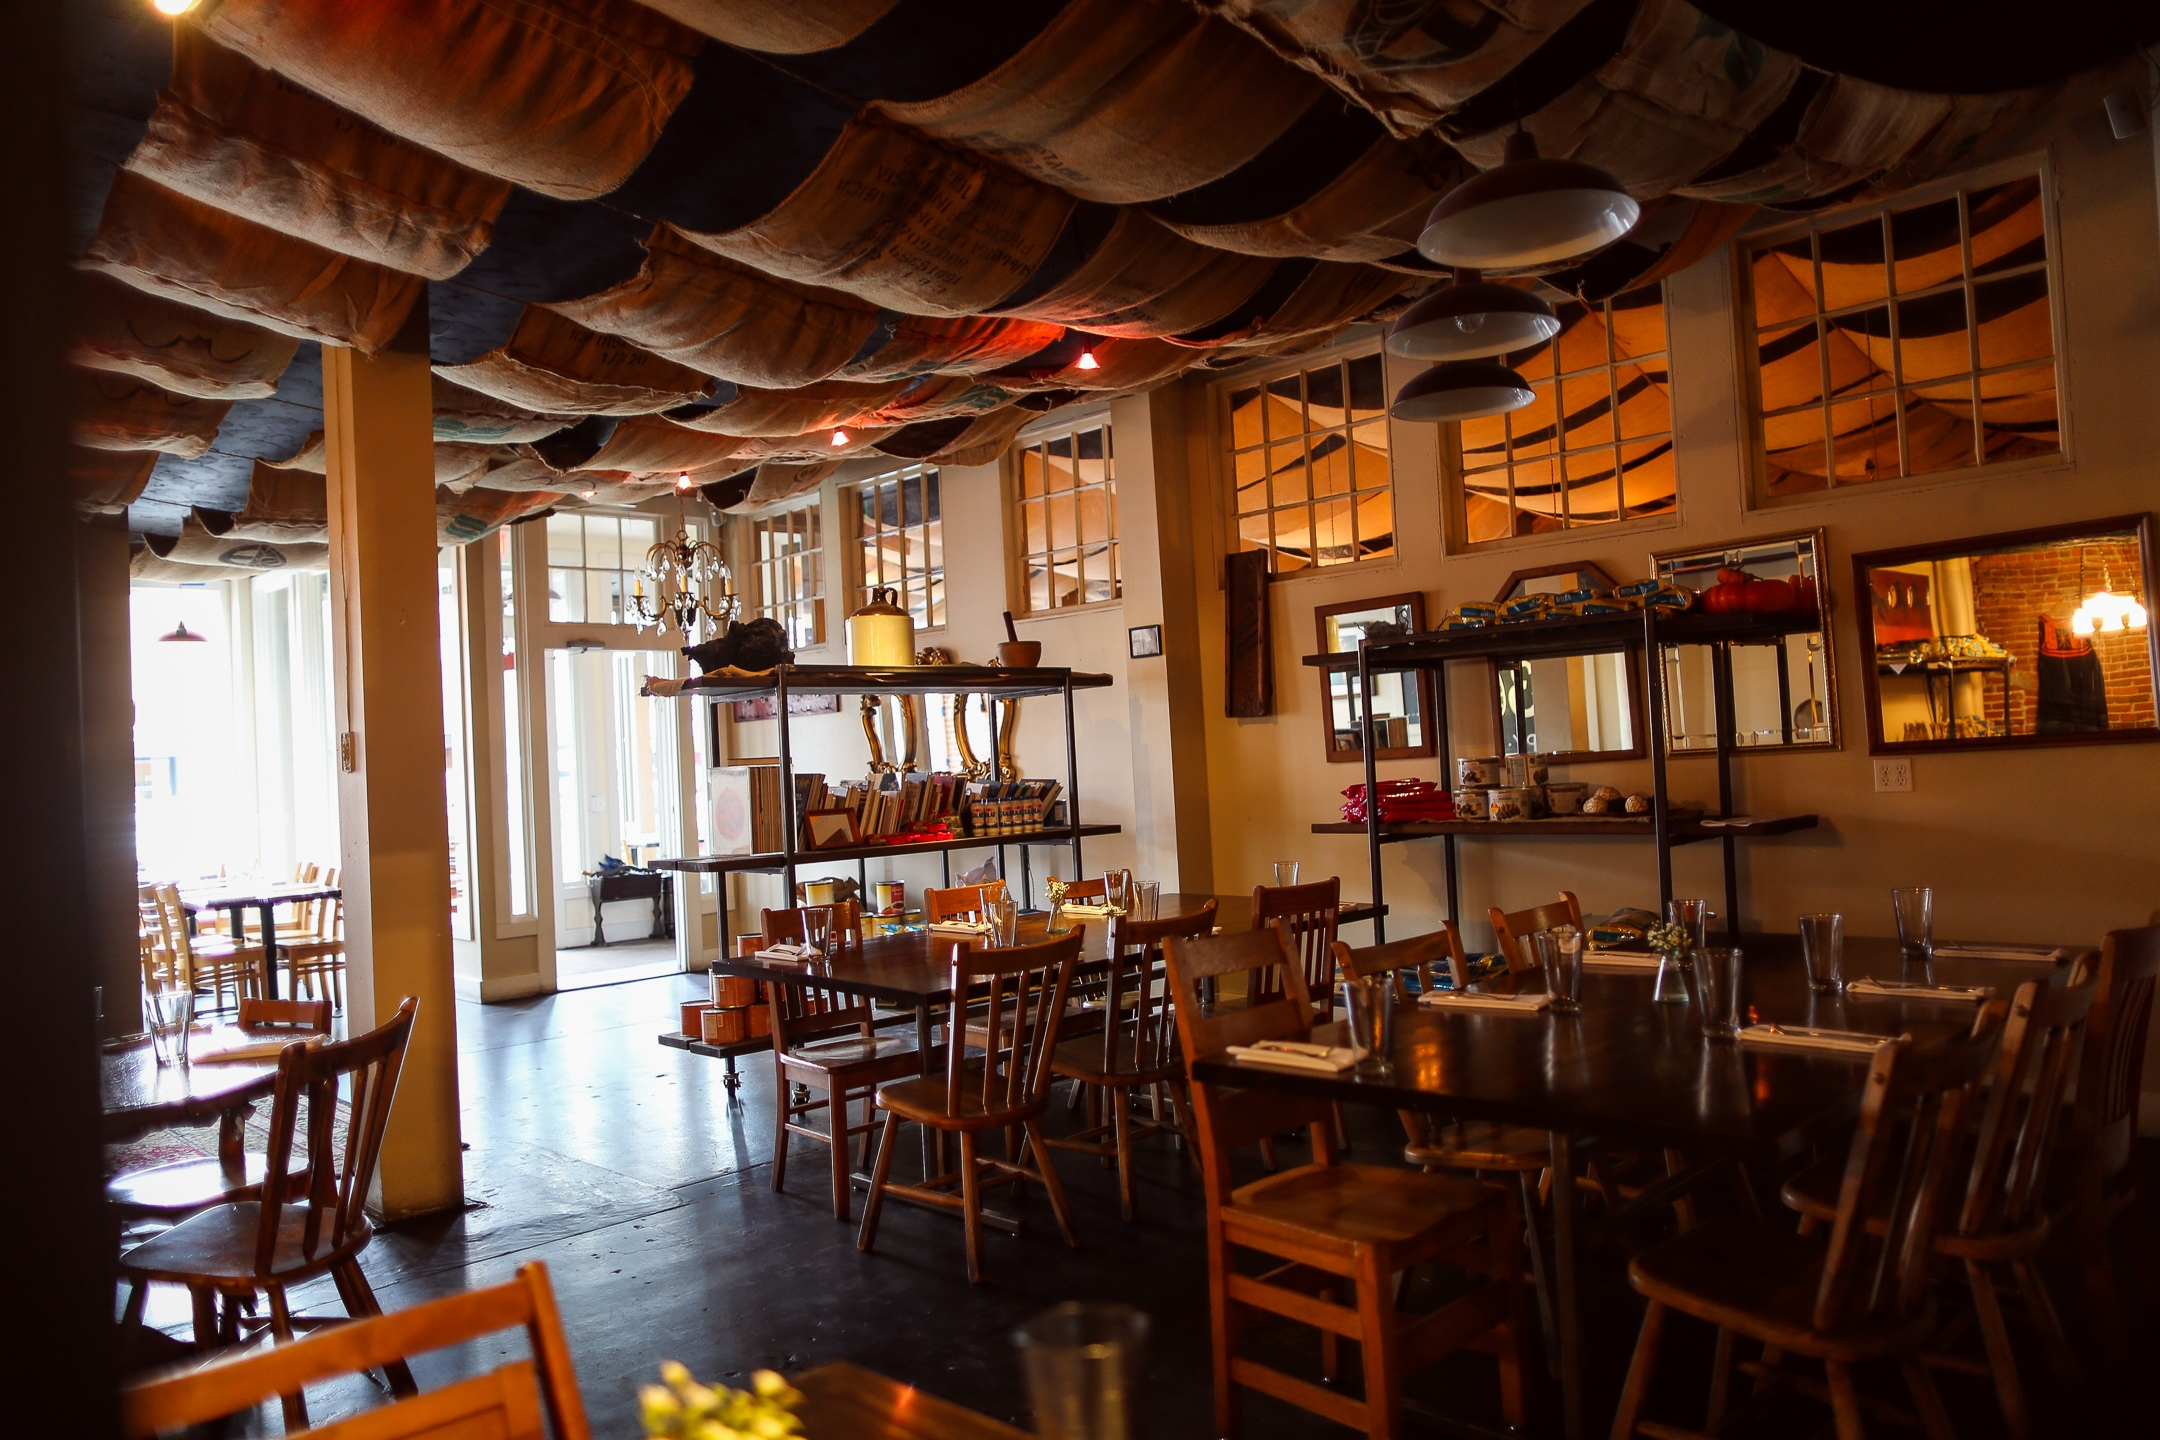 Black Cypress - Small Business Restaurant Profile WEbinar